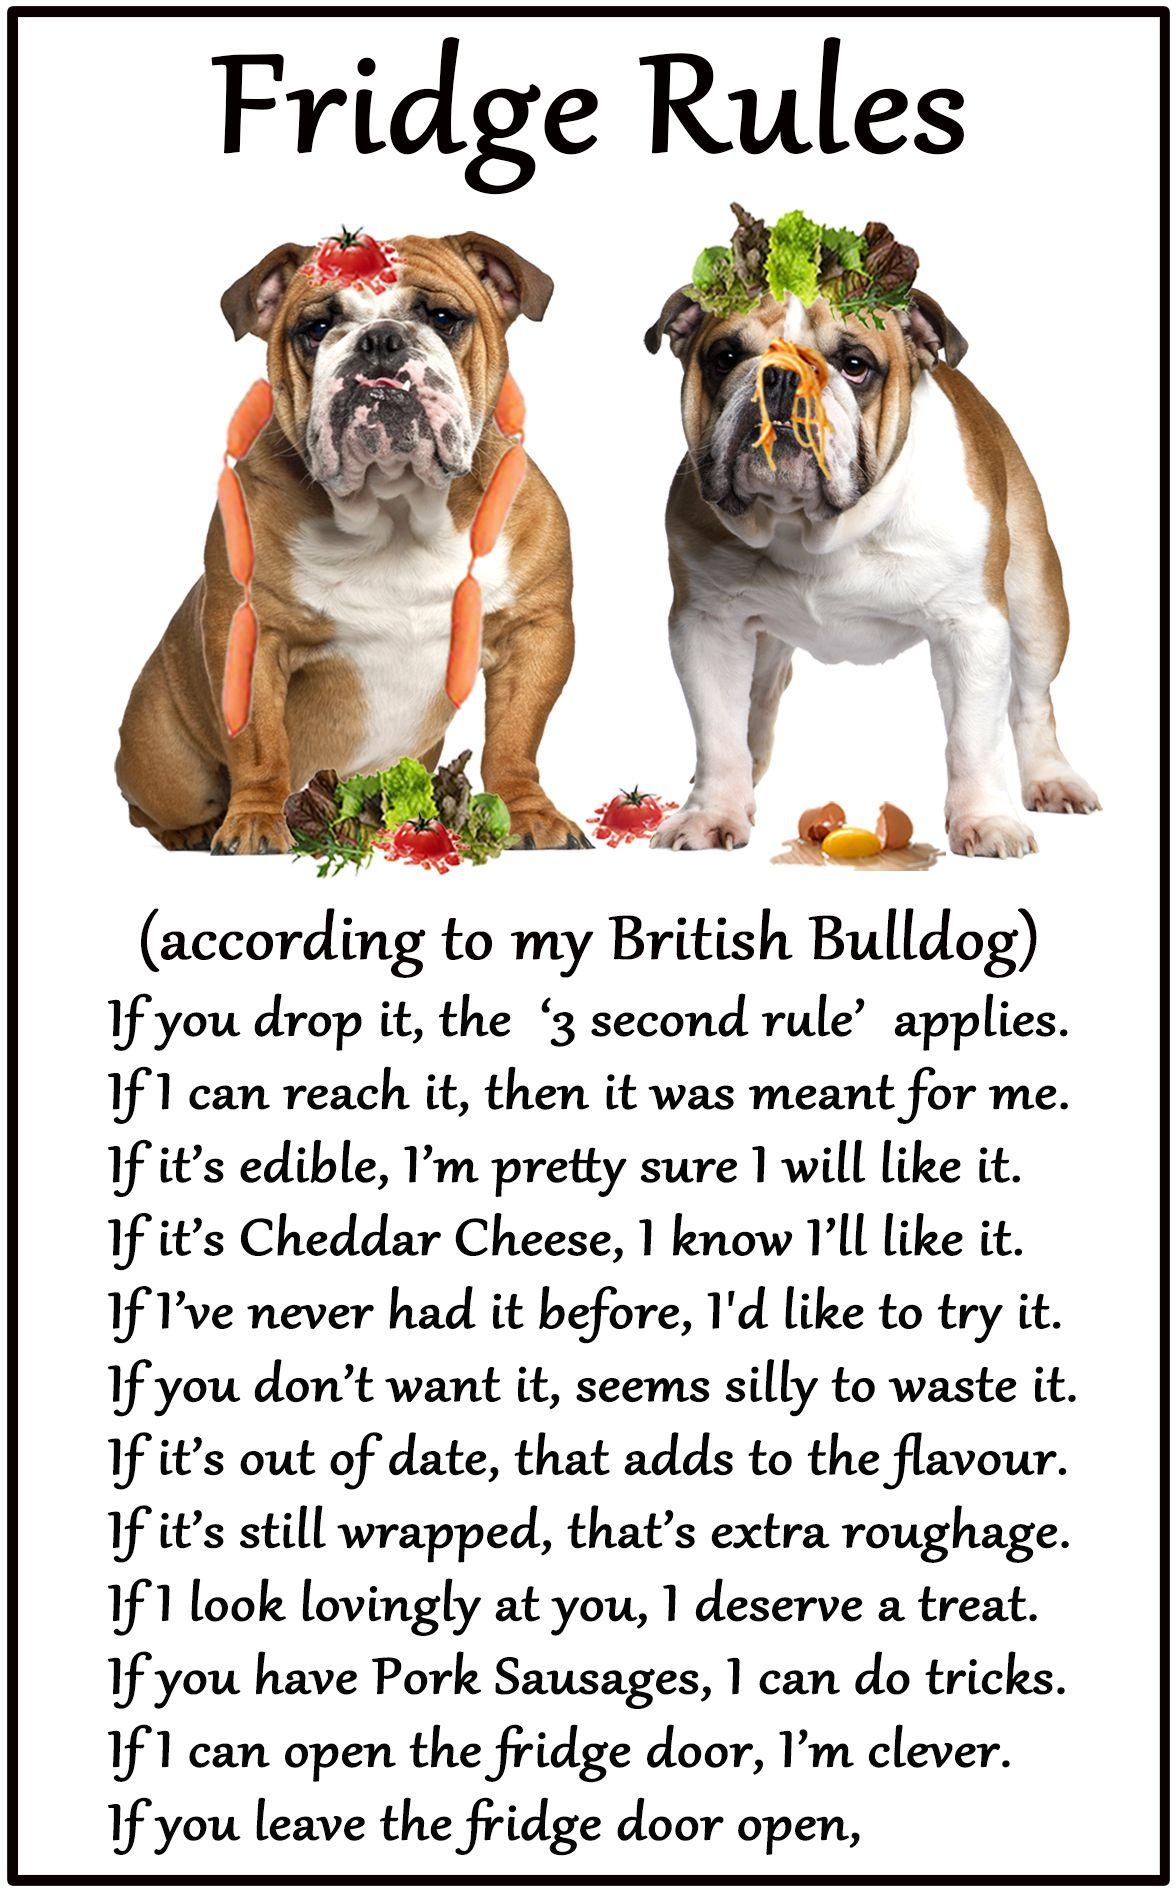 British Bulldog Humorous Dog Fridge Rules. Size